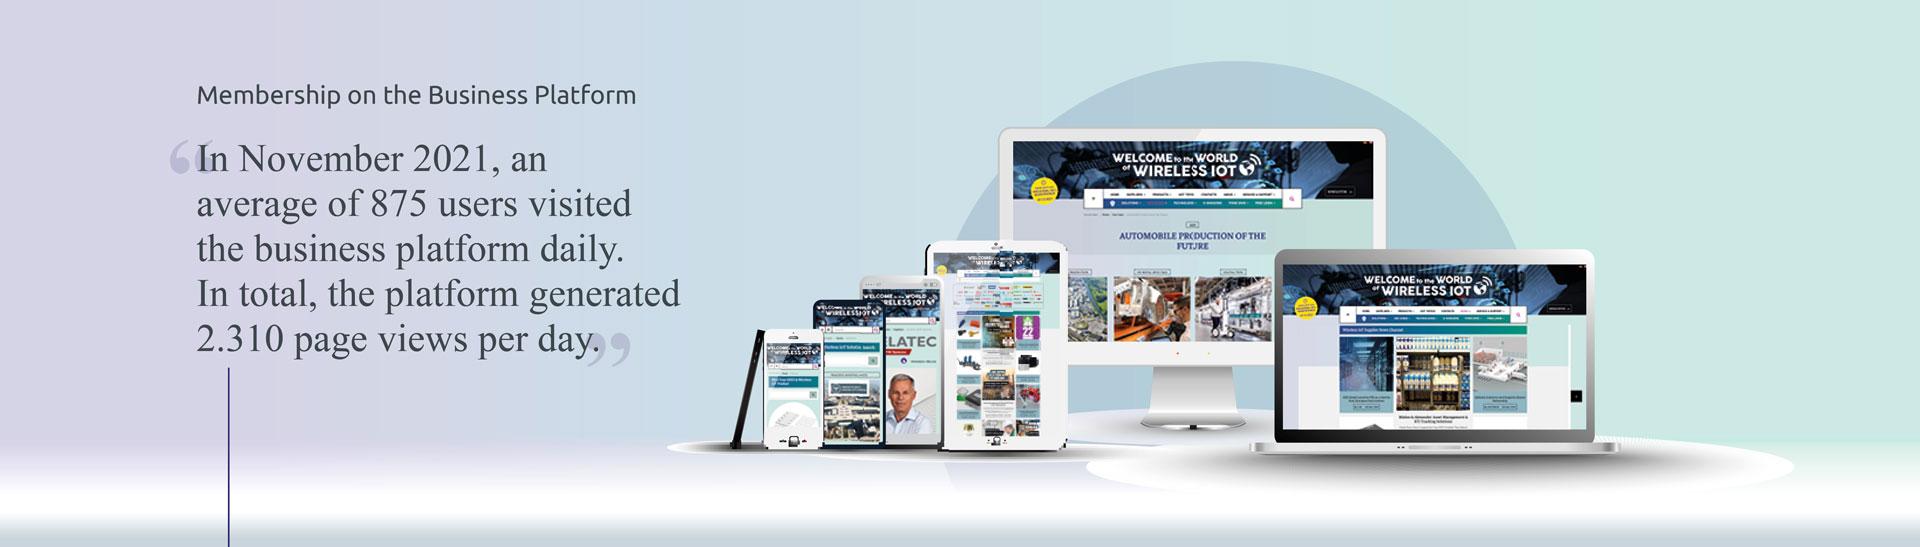 Membership on the Wireless IOT Business Platform